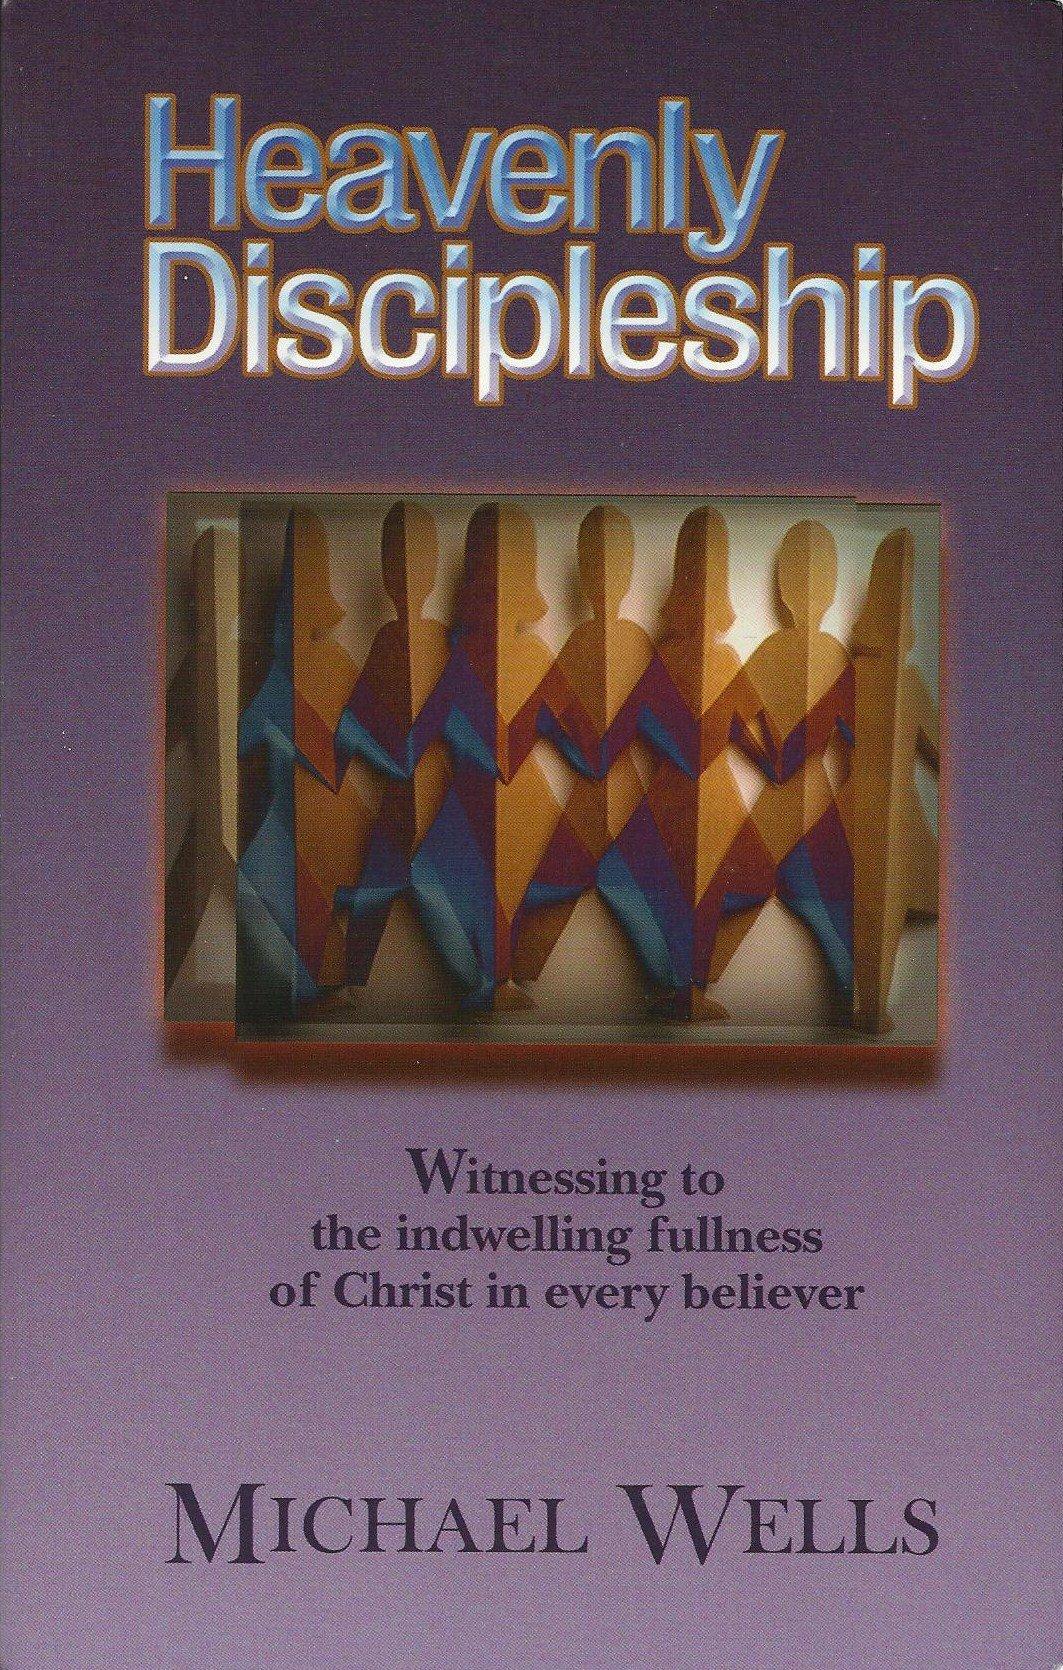 Heavenly Discipleship